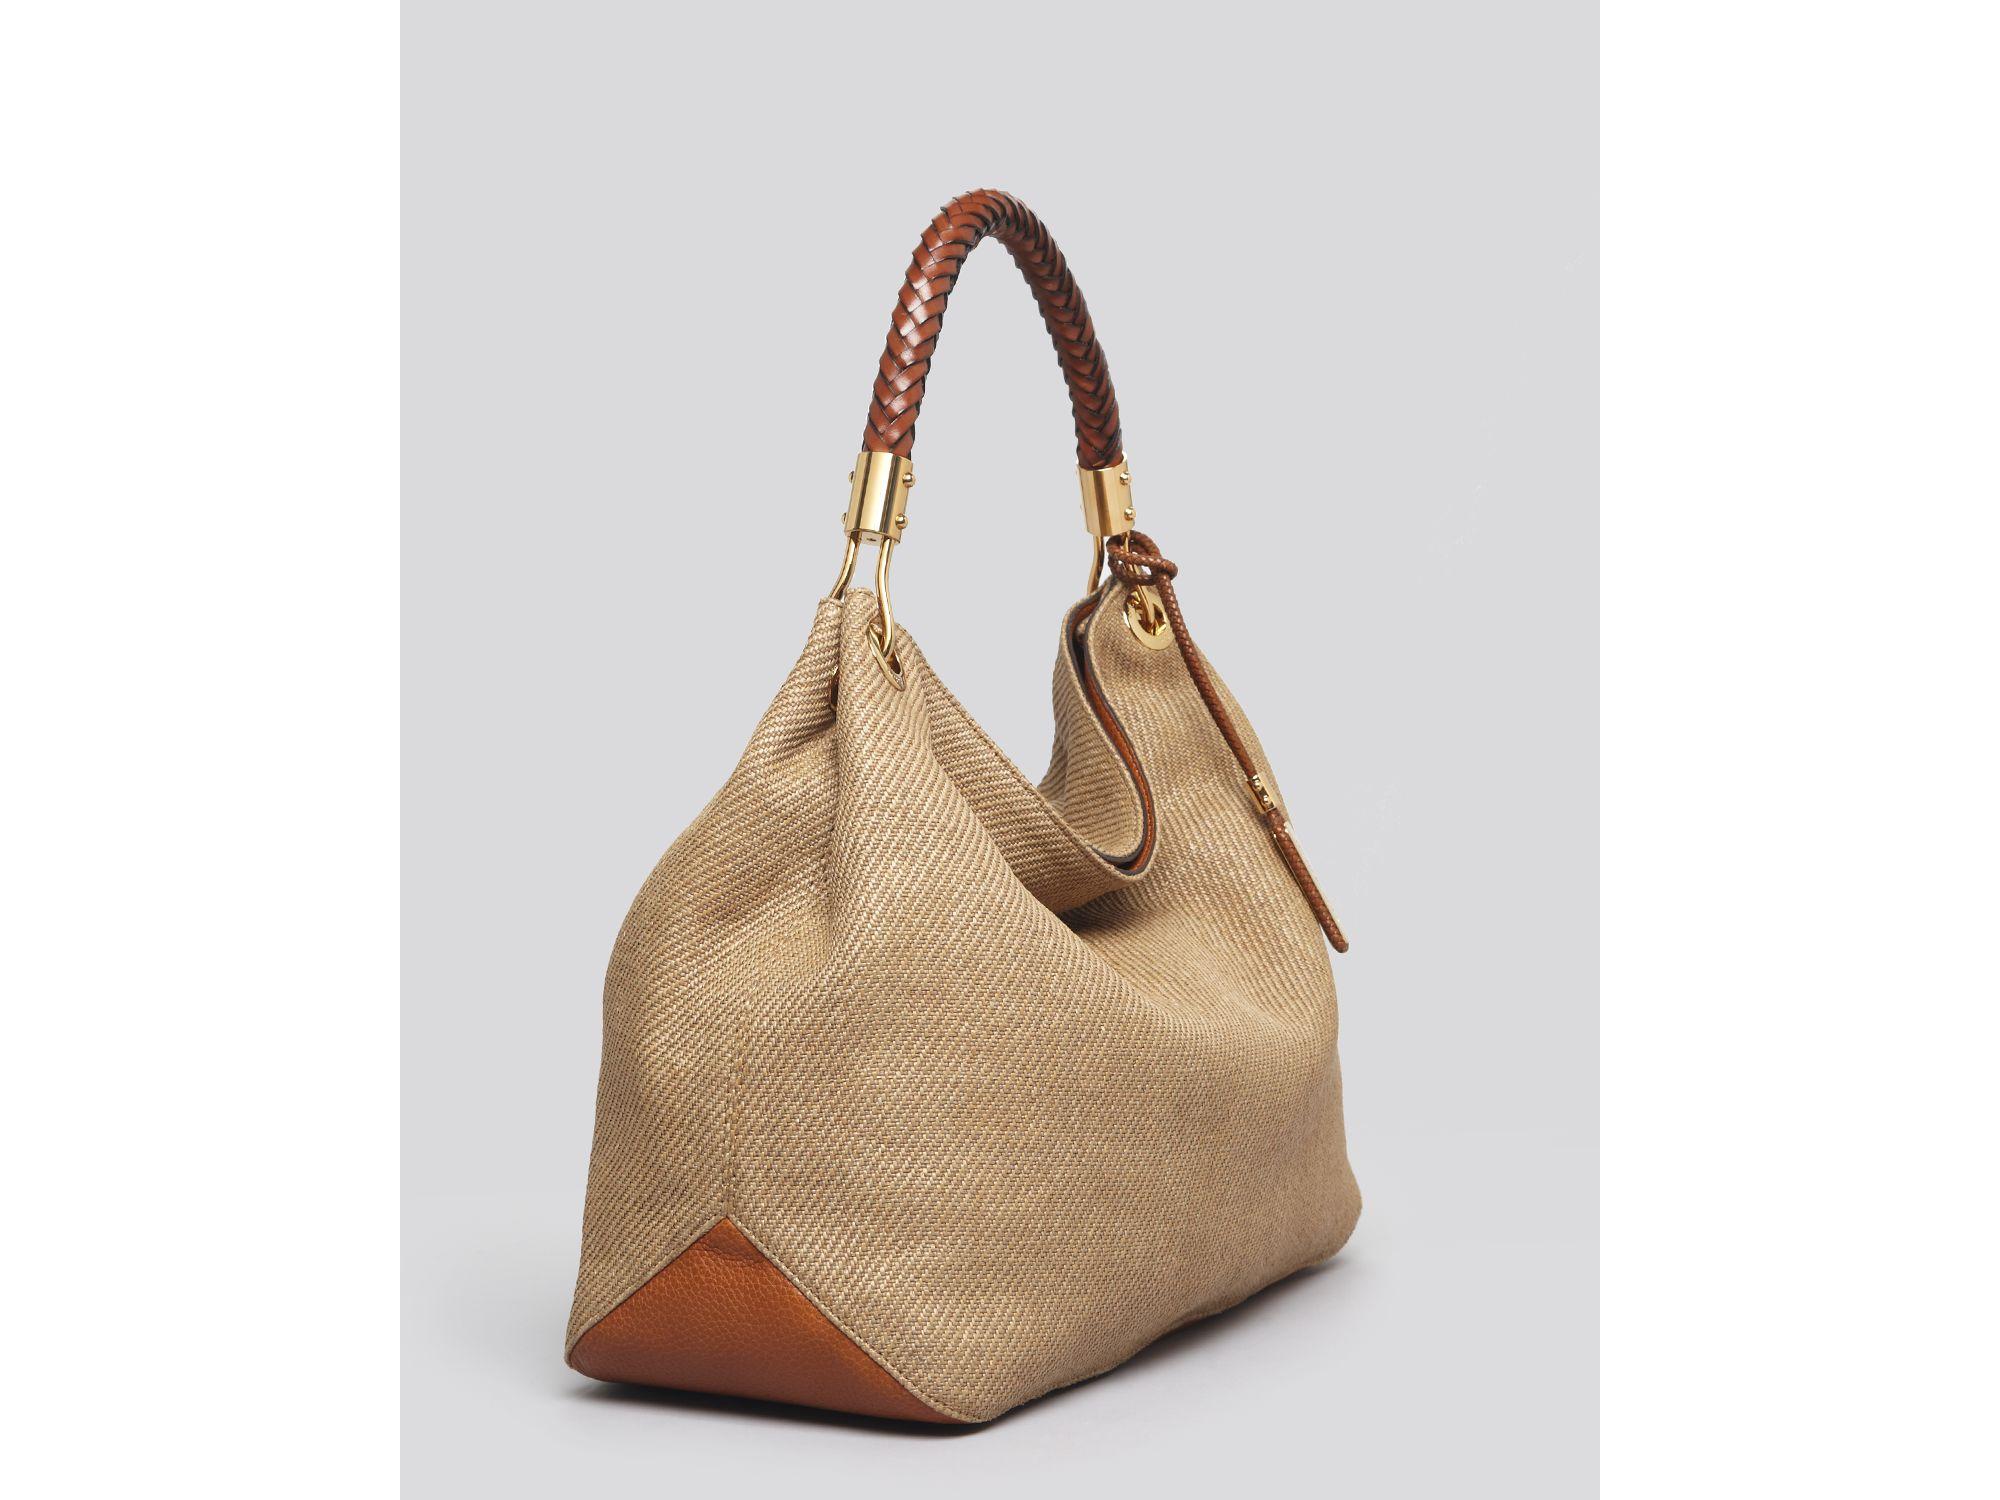 8fc45e483644 Lyst - Michael Kors Large Shoulder Bag Skorpios Woven in Natural